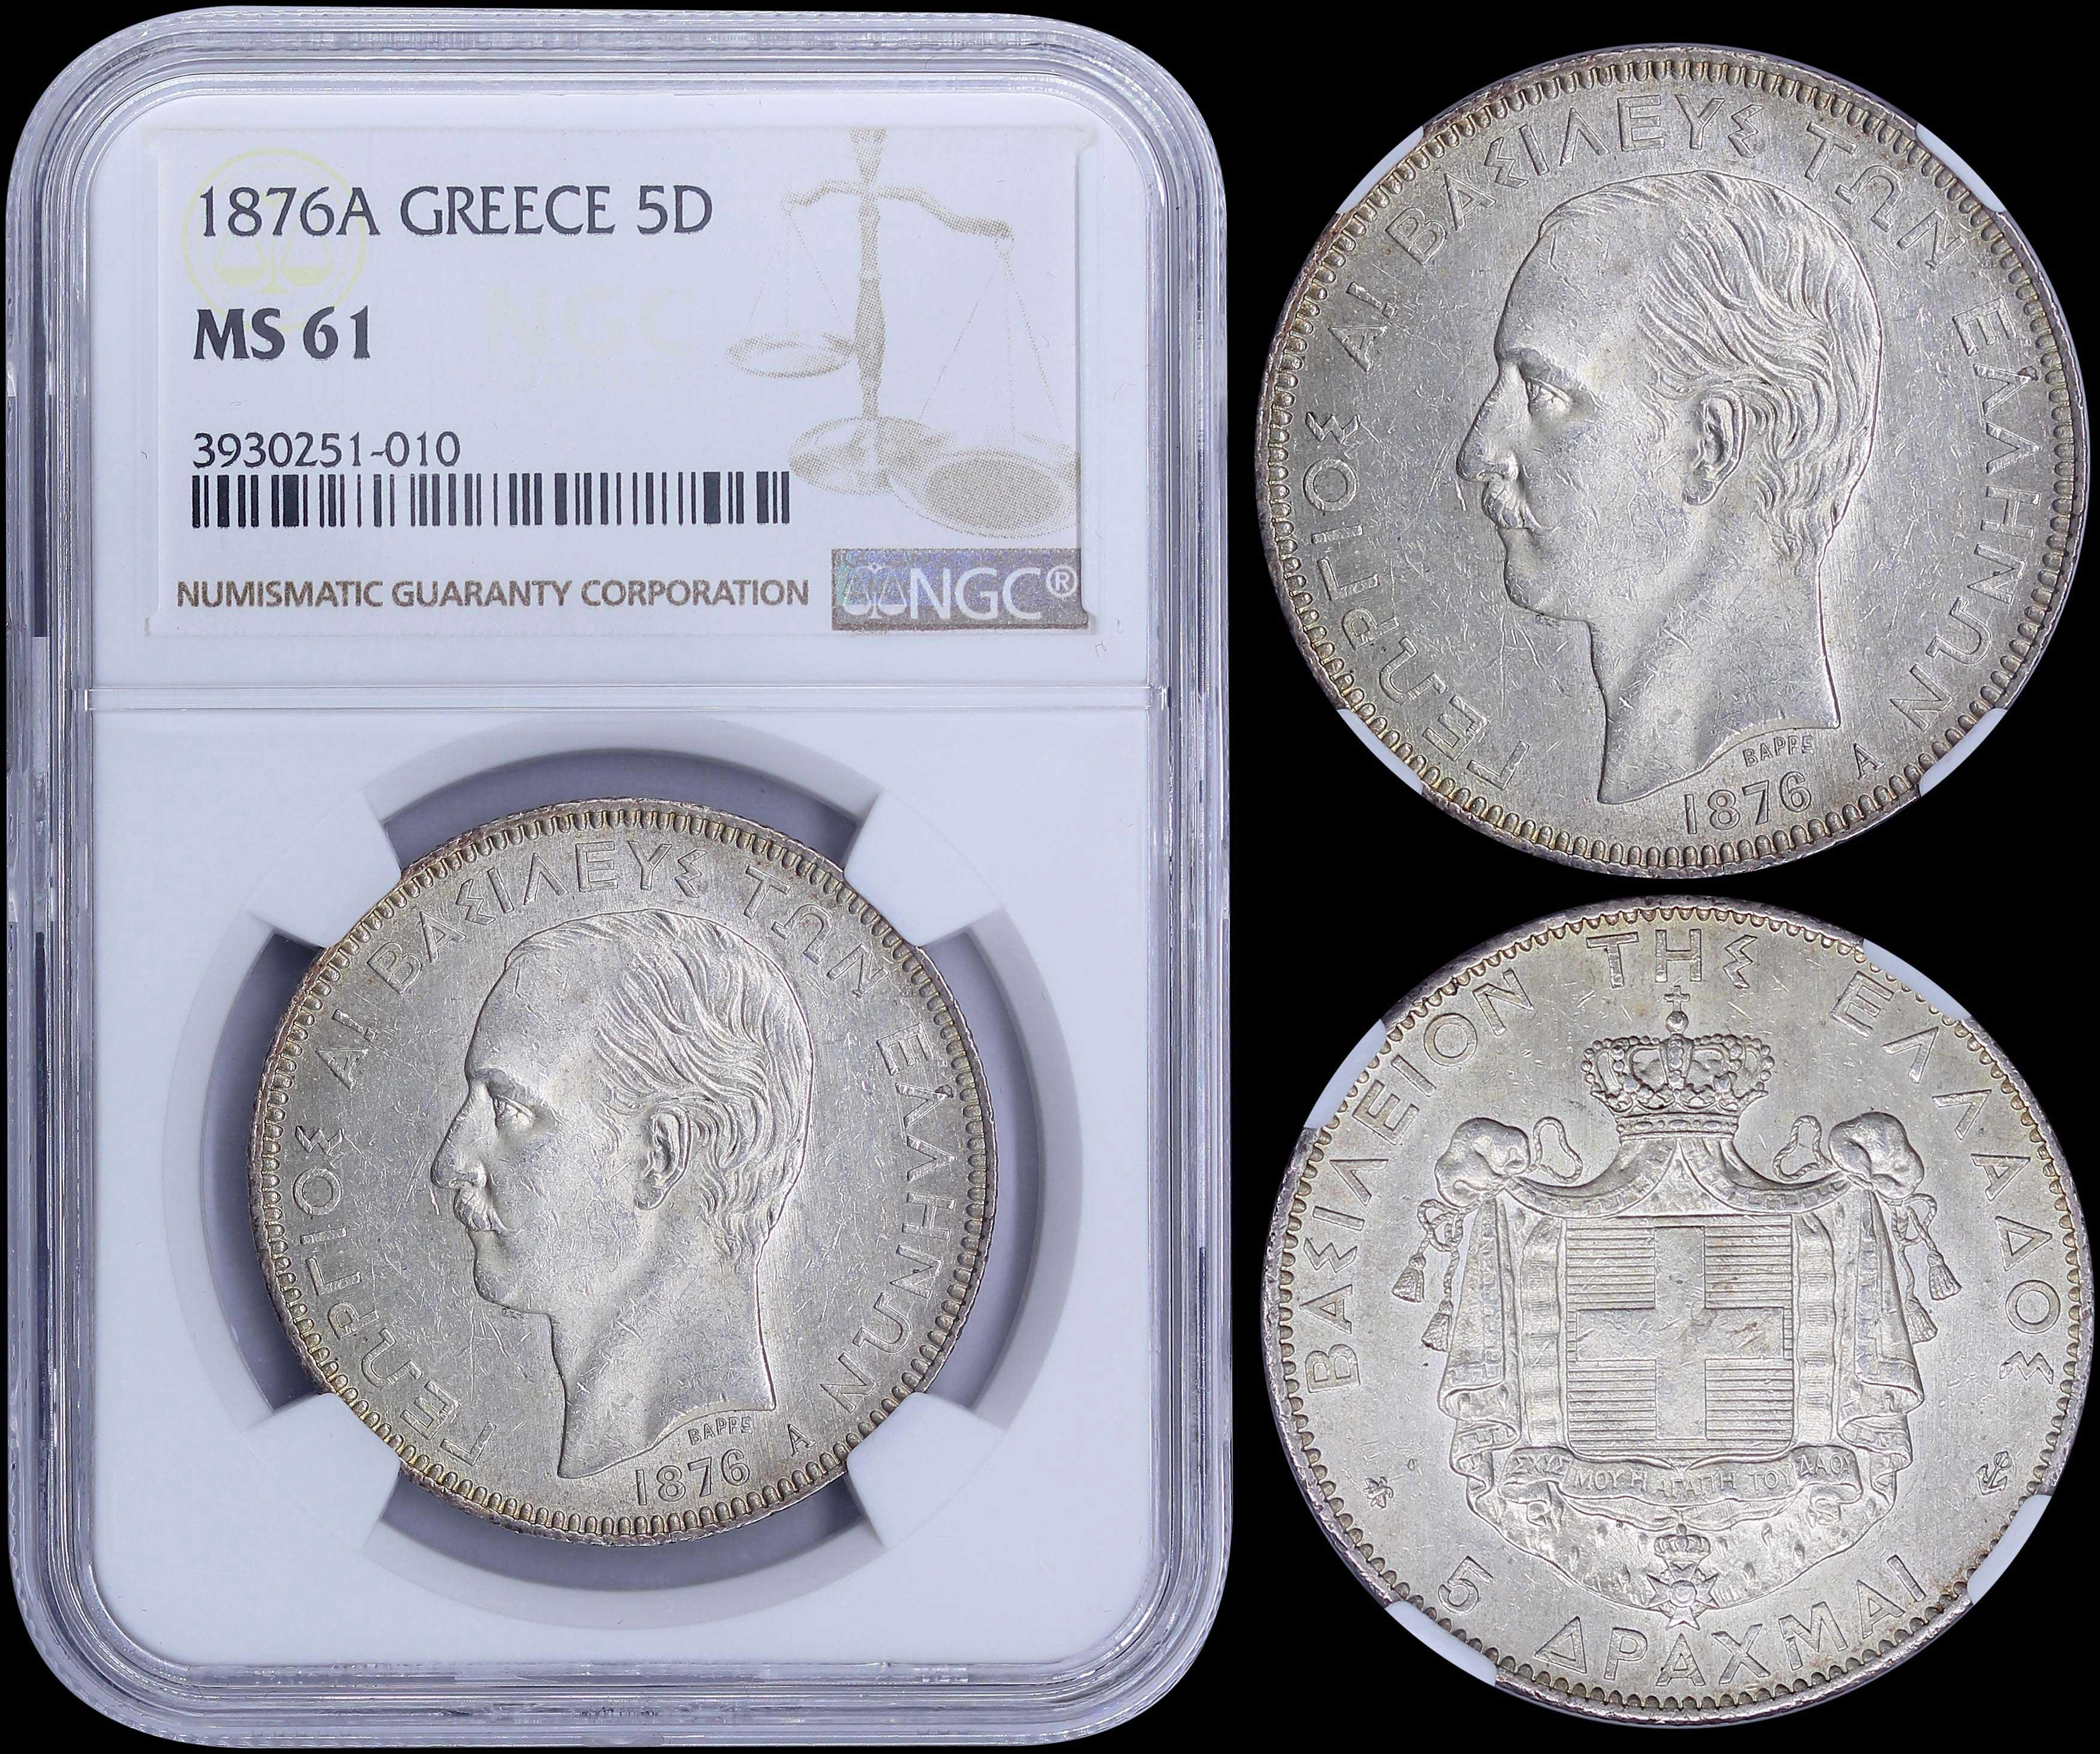 Lot 8129 - -  COINS & TOKENS king george i -  A. Karamitsos Public & Live Bid Auction 644 Coins, Medals & Banknotes